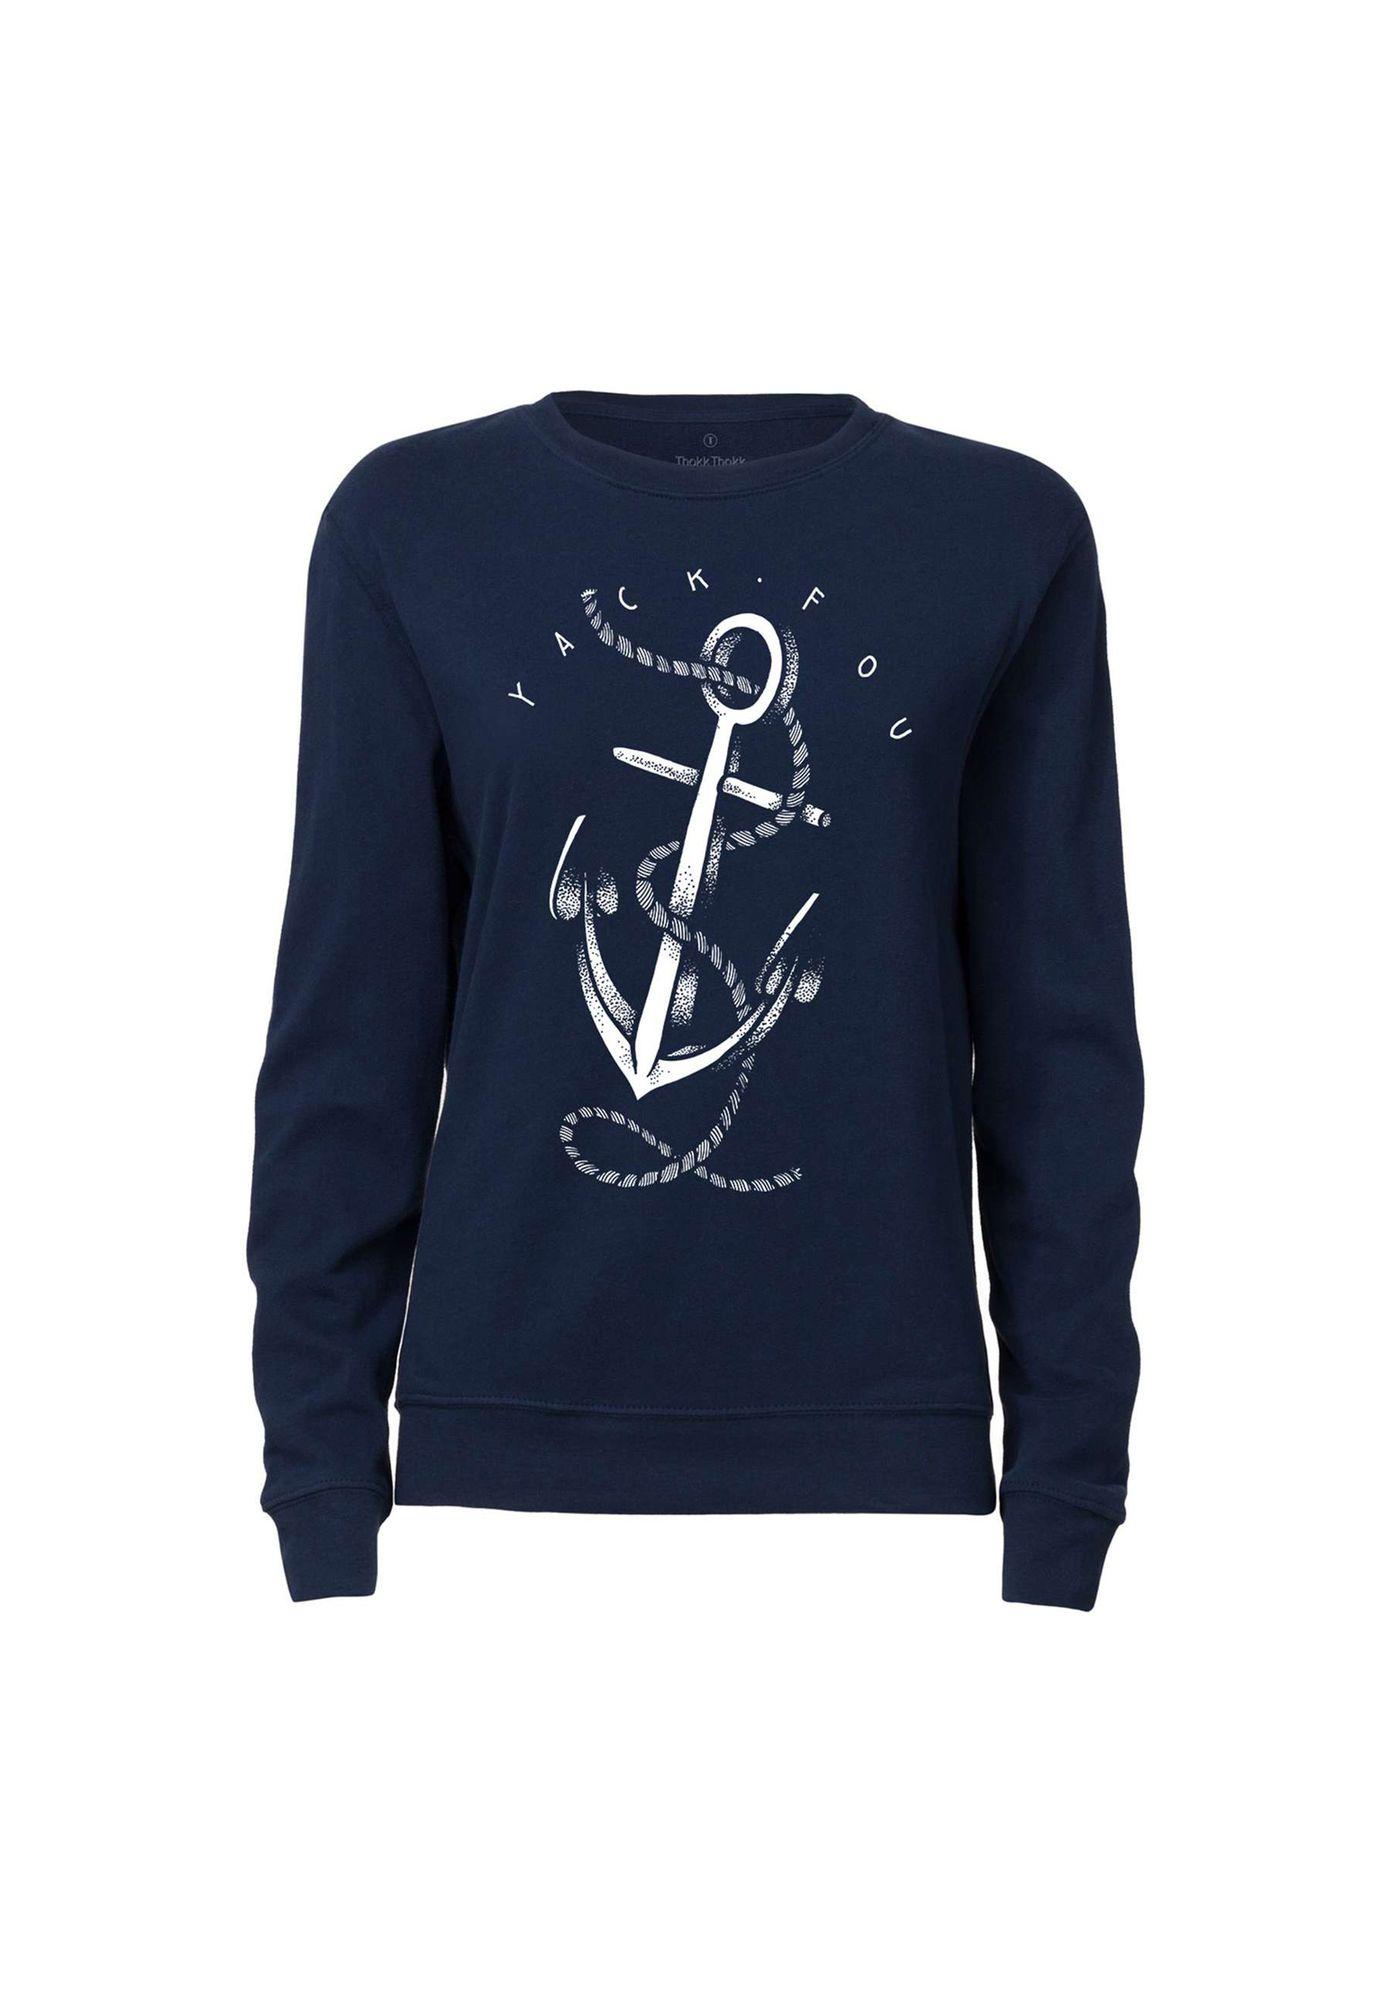 Rundhals Sweatshirt Anker Navy